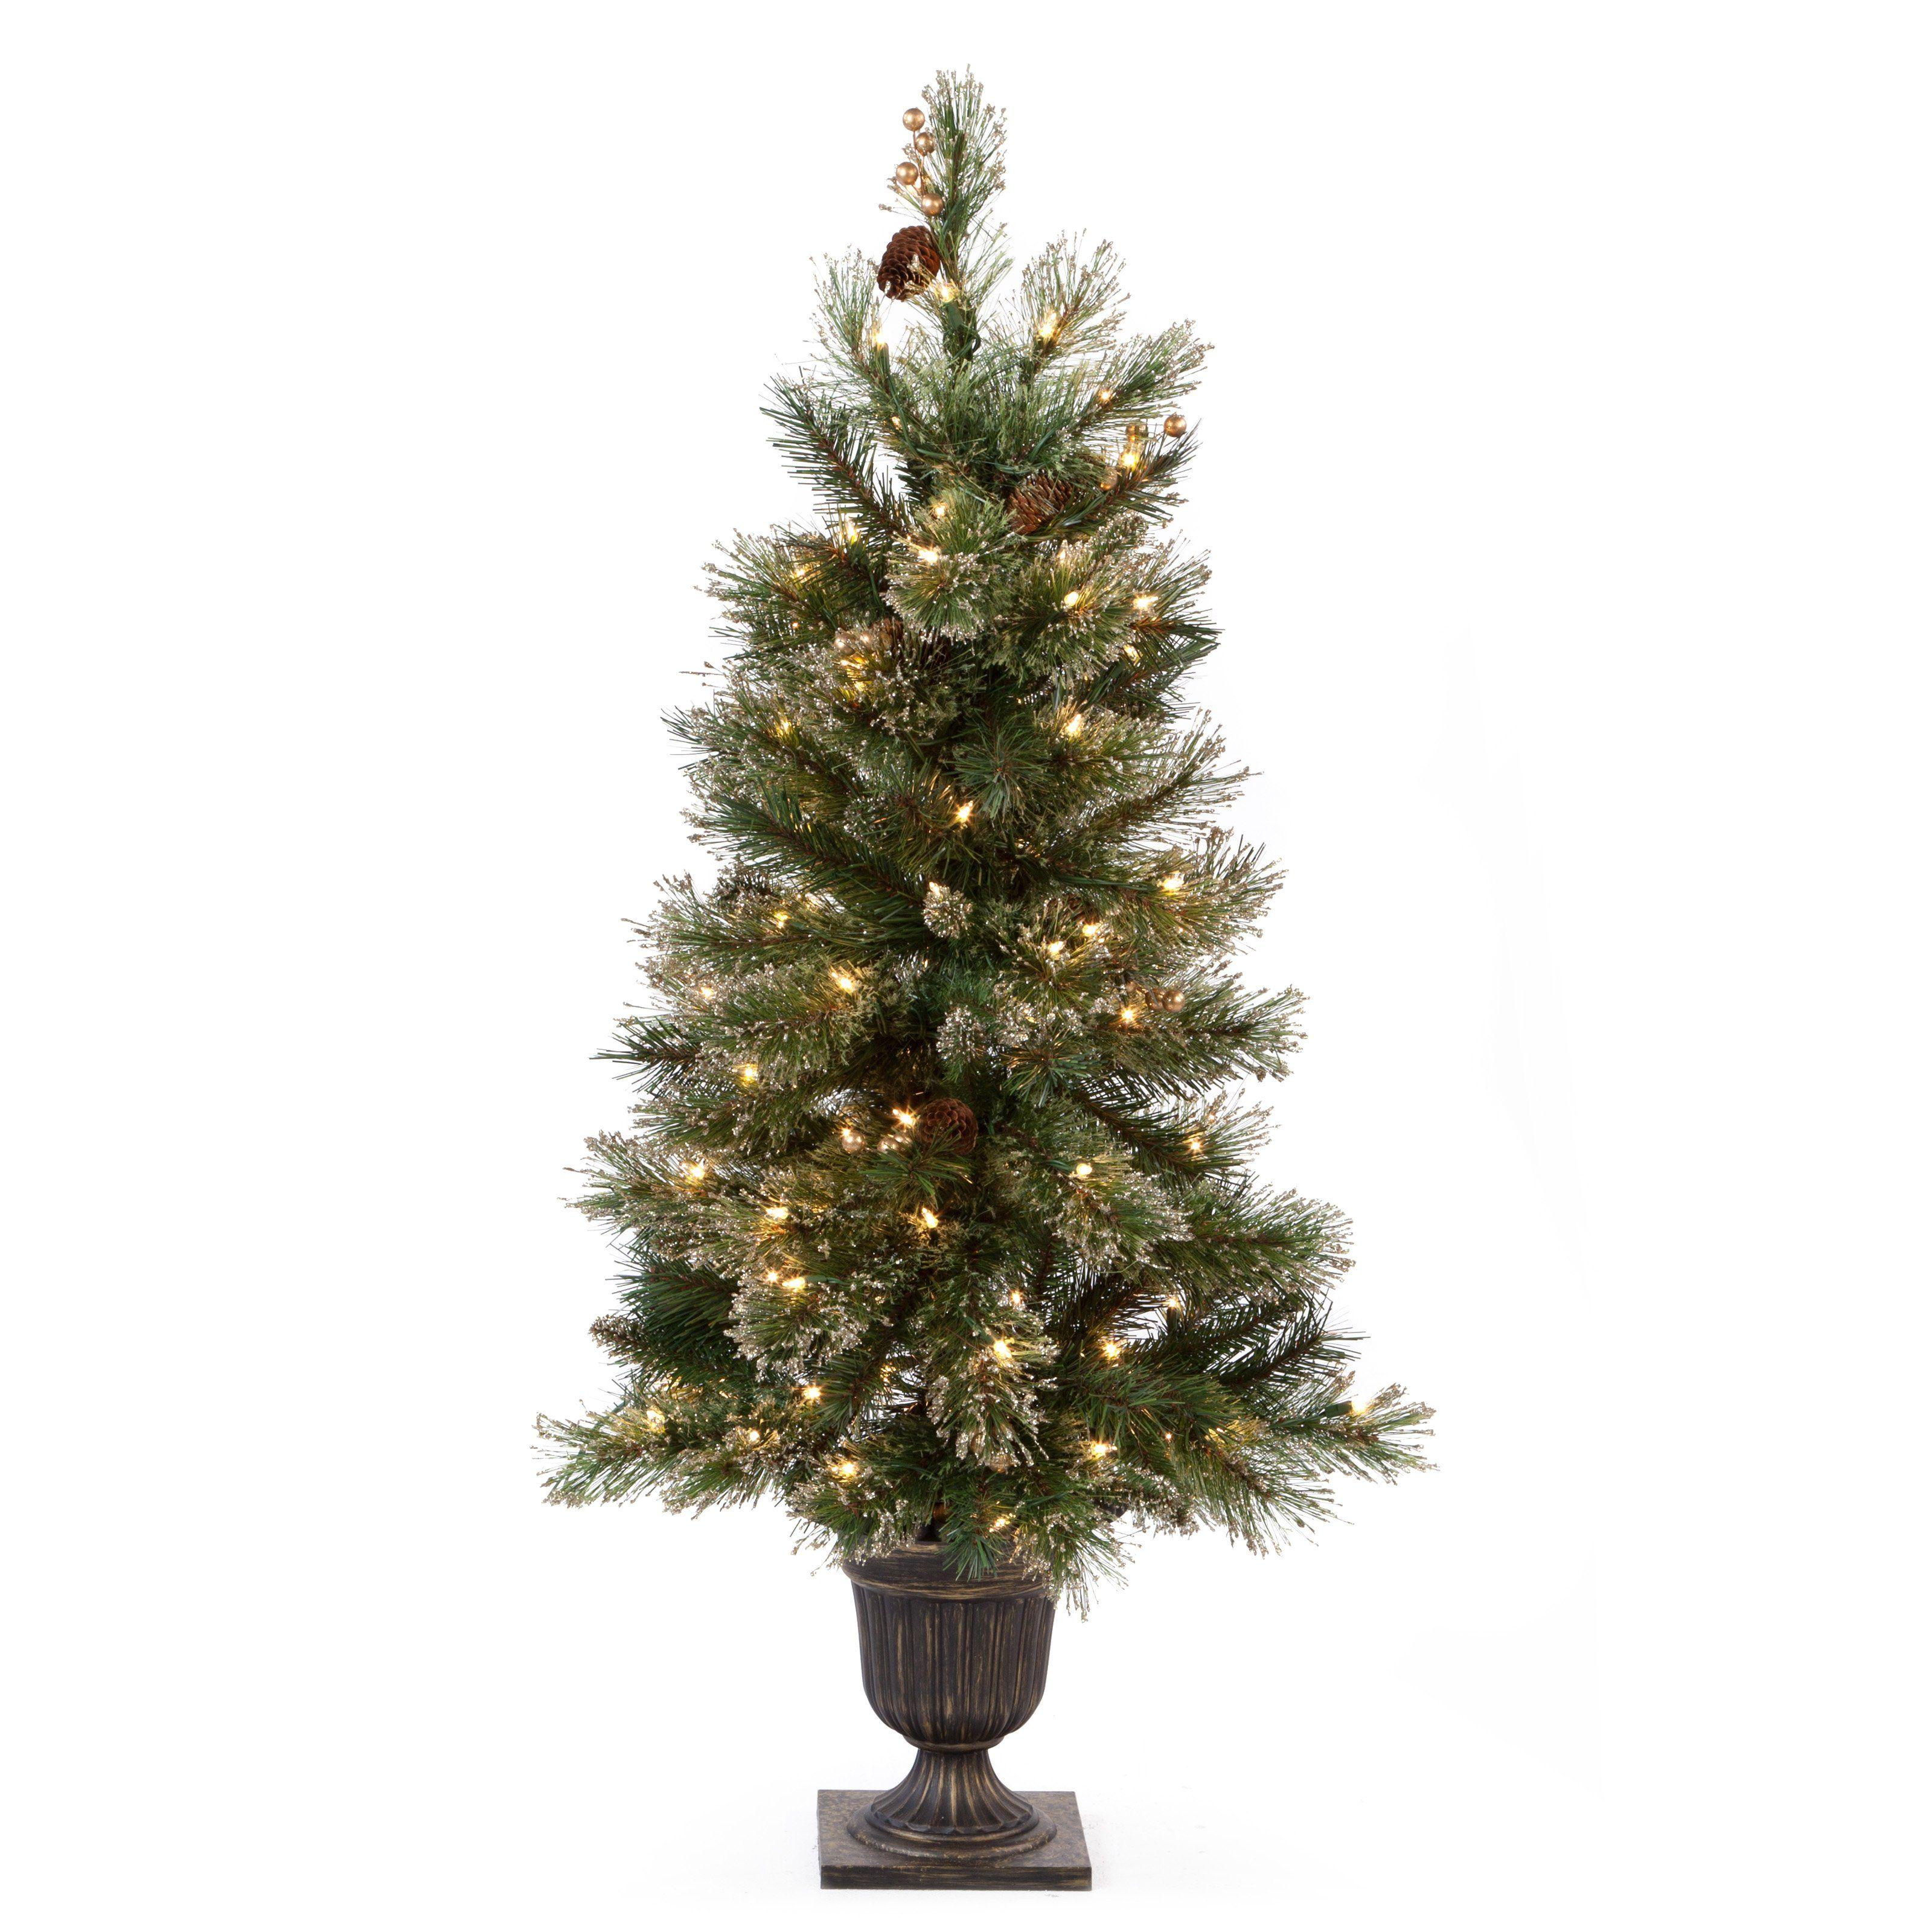 Apartment Tree! 4 ft. Glittery Gold Pine PreLit Entrance